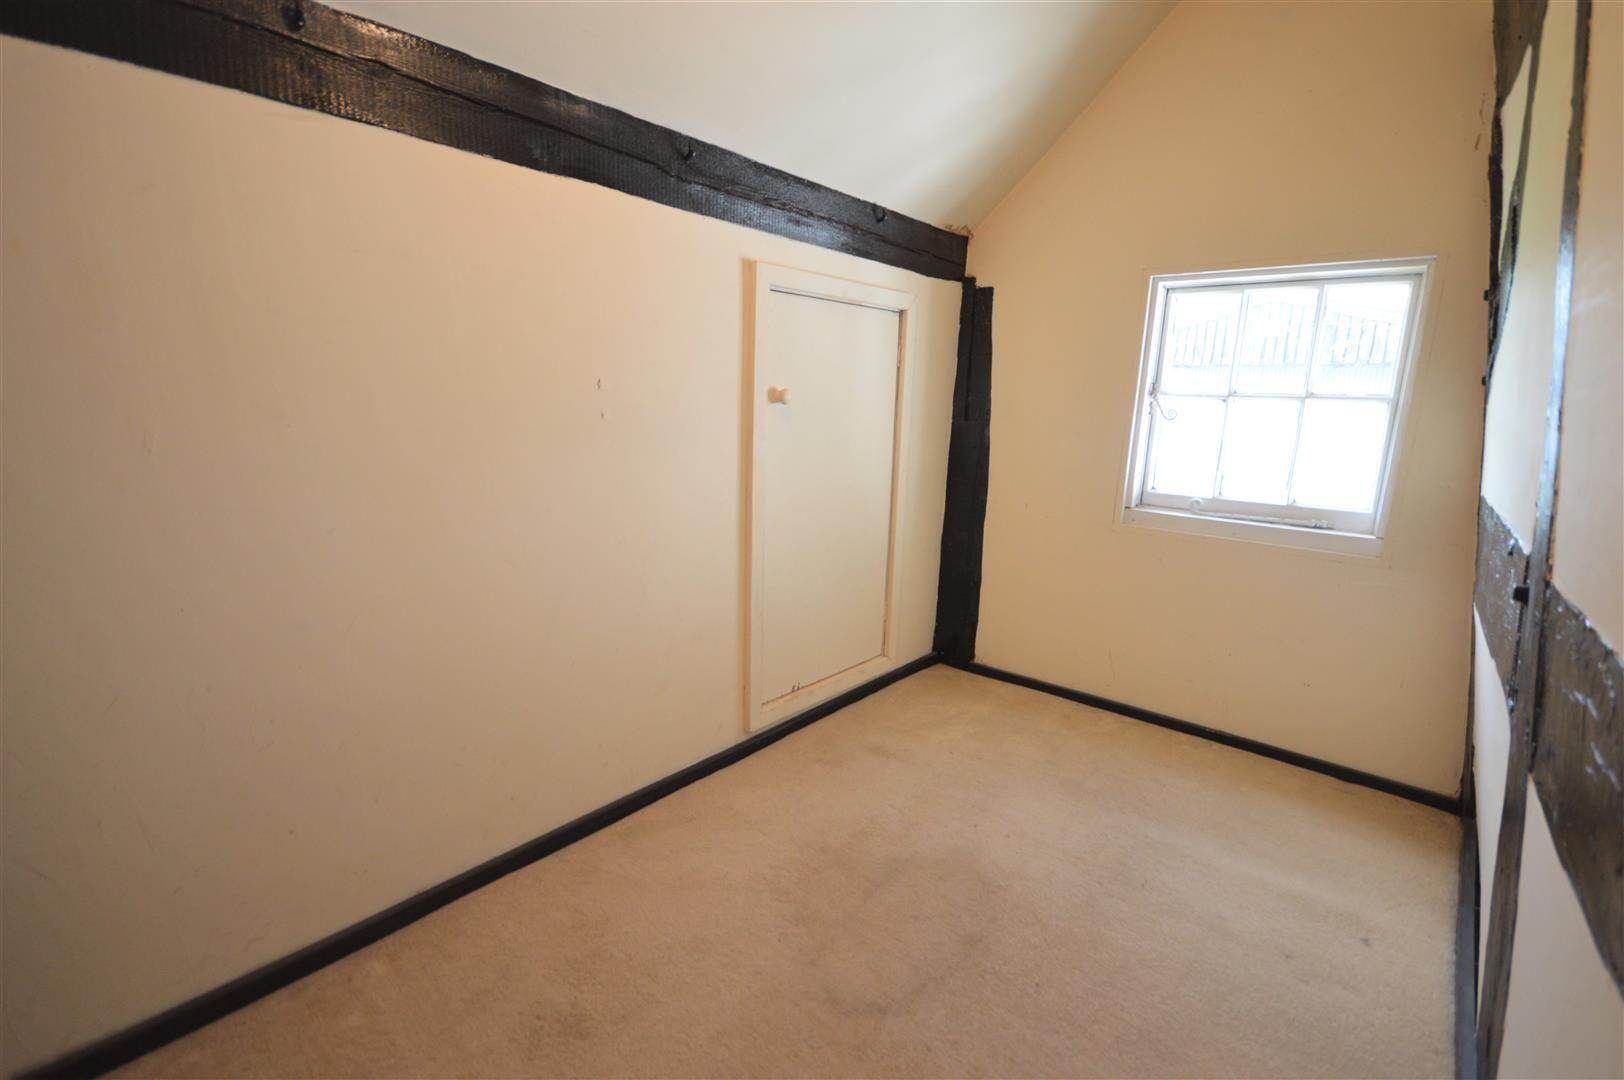 3 bed cottage for sale in Pembridge  - Property Image 11